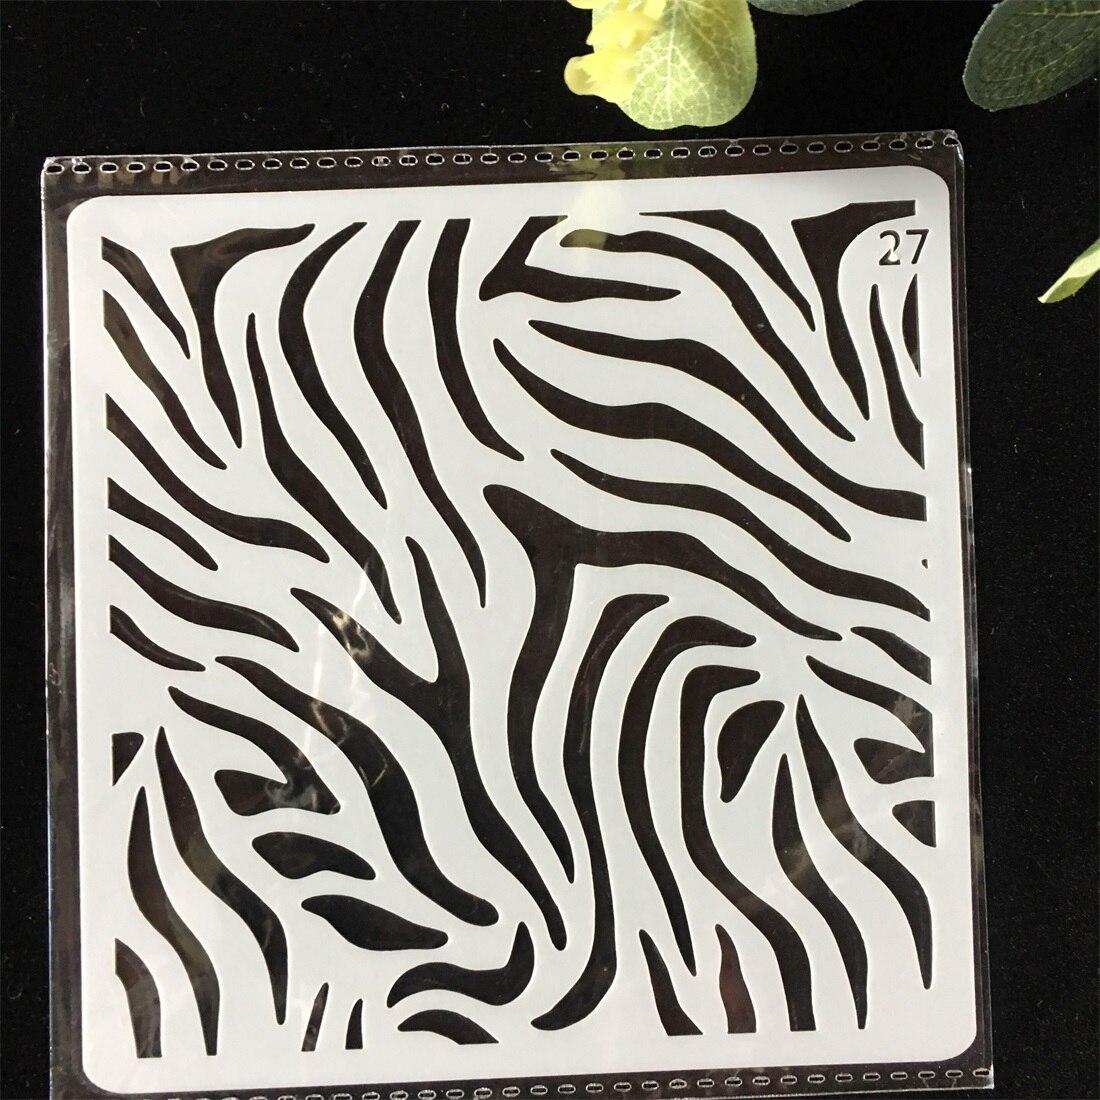 1Pcs 13cm Wood Texture DIY Layering Stencils Wall Painting Scrapbook Coloring Embossing Album Decorative Card Template